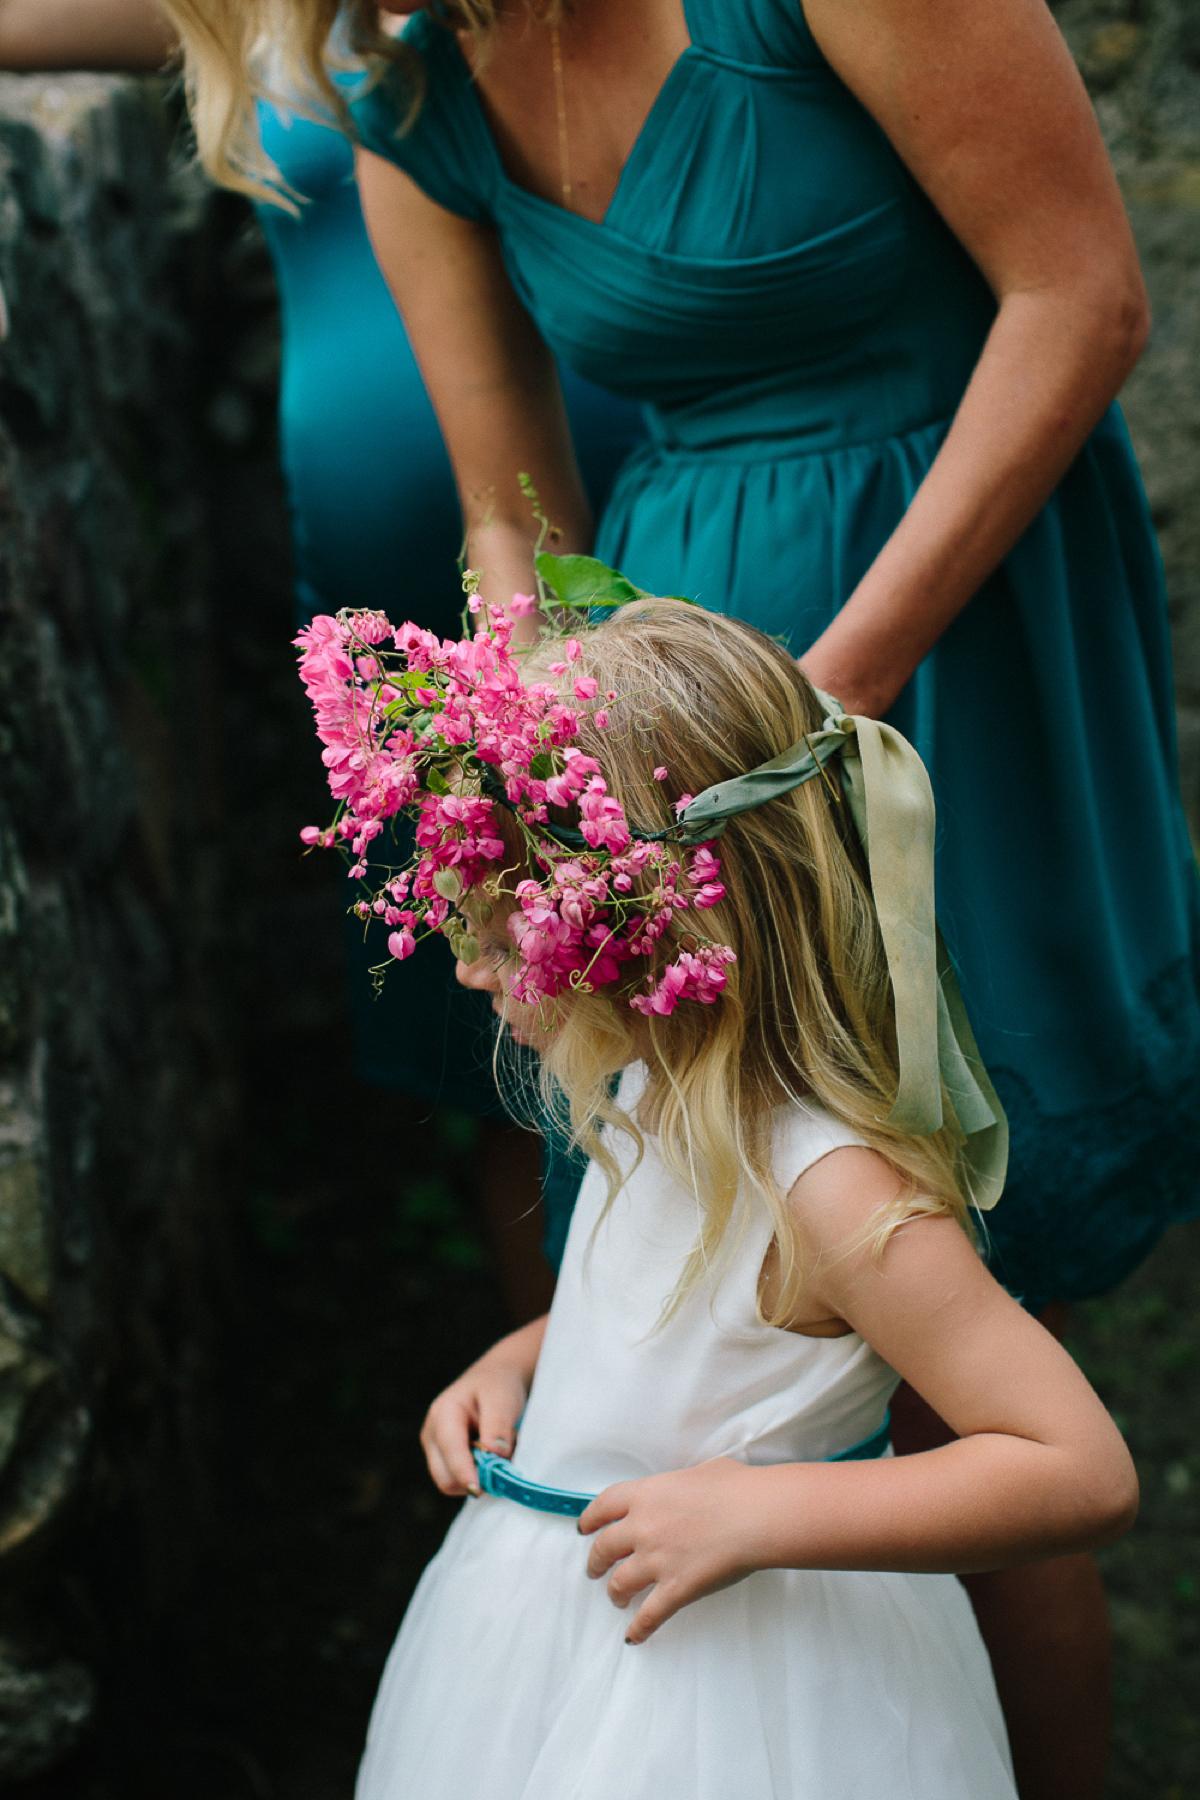 St_Croix_Wedding_Abi_Q_Photography_-140.jpg